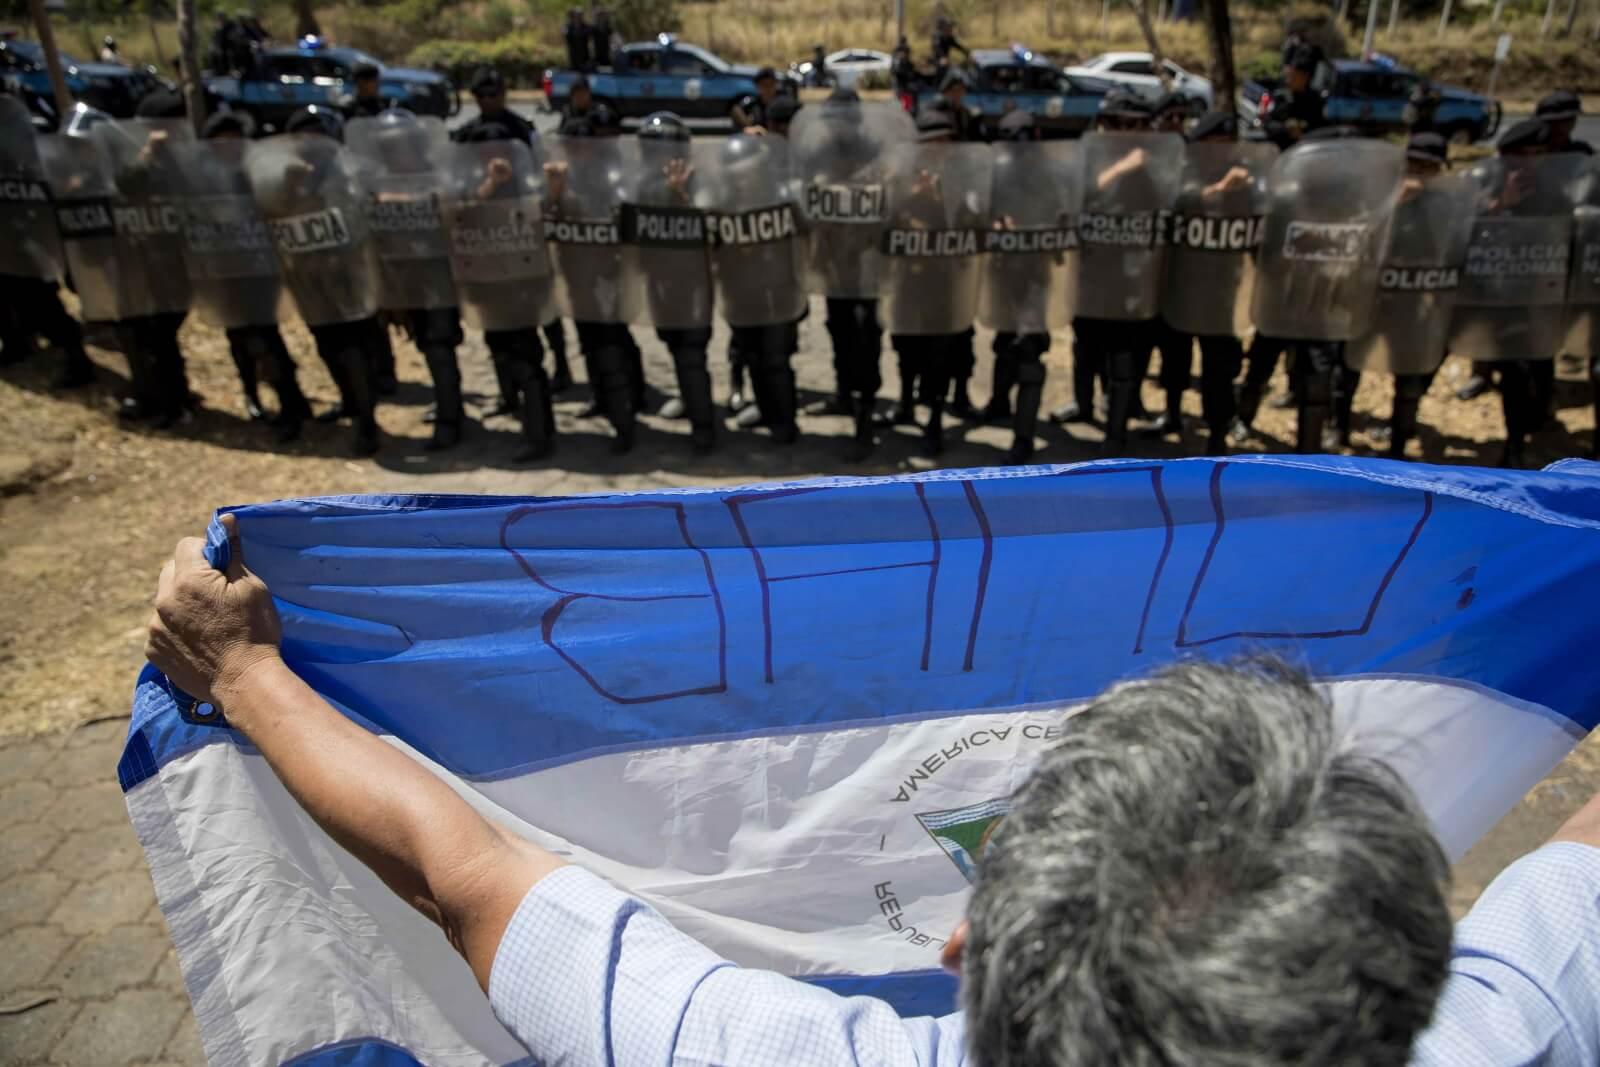 Protesty w Nikaragui fot. EPA/Jorge Torres